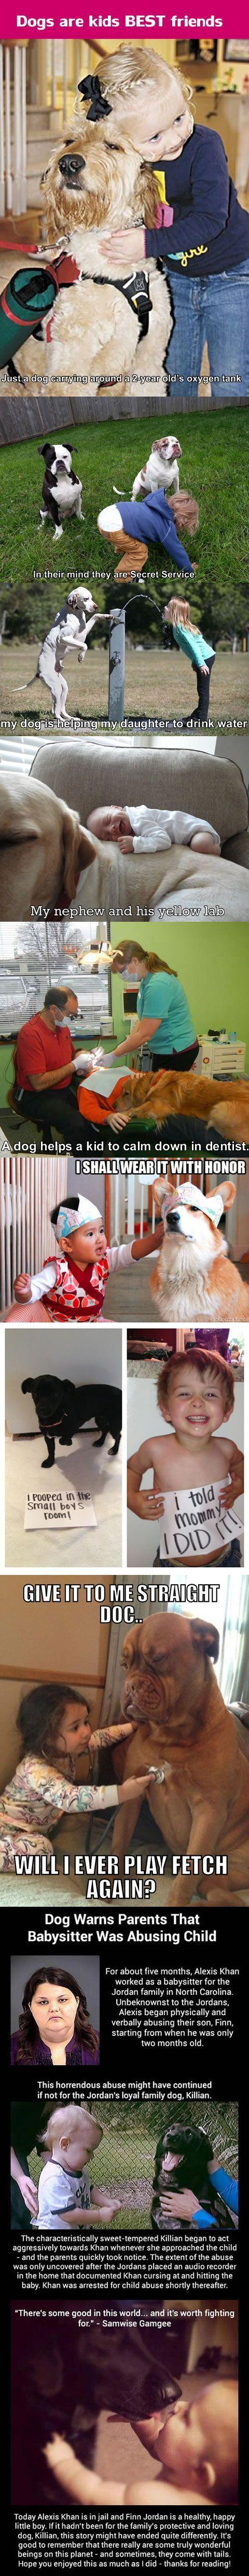 best doggies images on pinterest diy dog dog stuff and raised